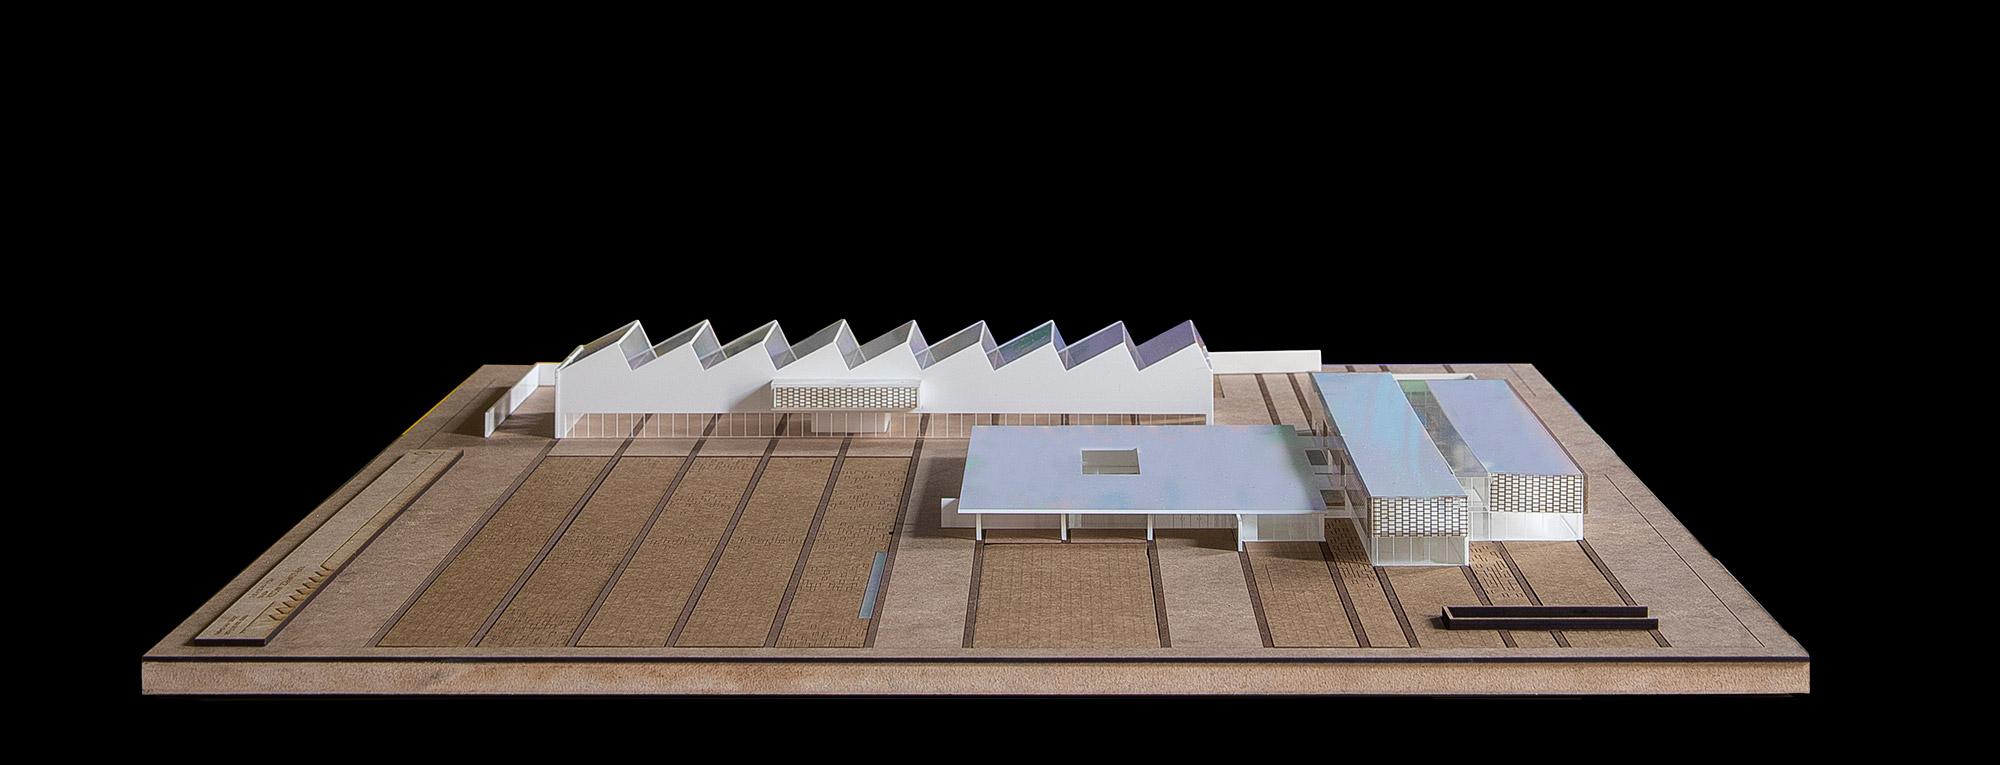 Maqueta arquitectura pfc tfg upv coworking macosa 4 - Servicios de arquitectura ...